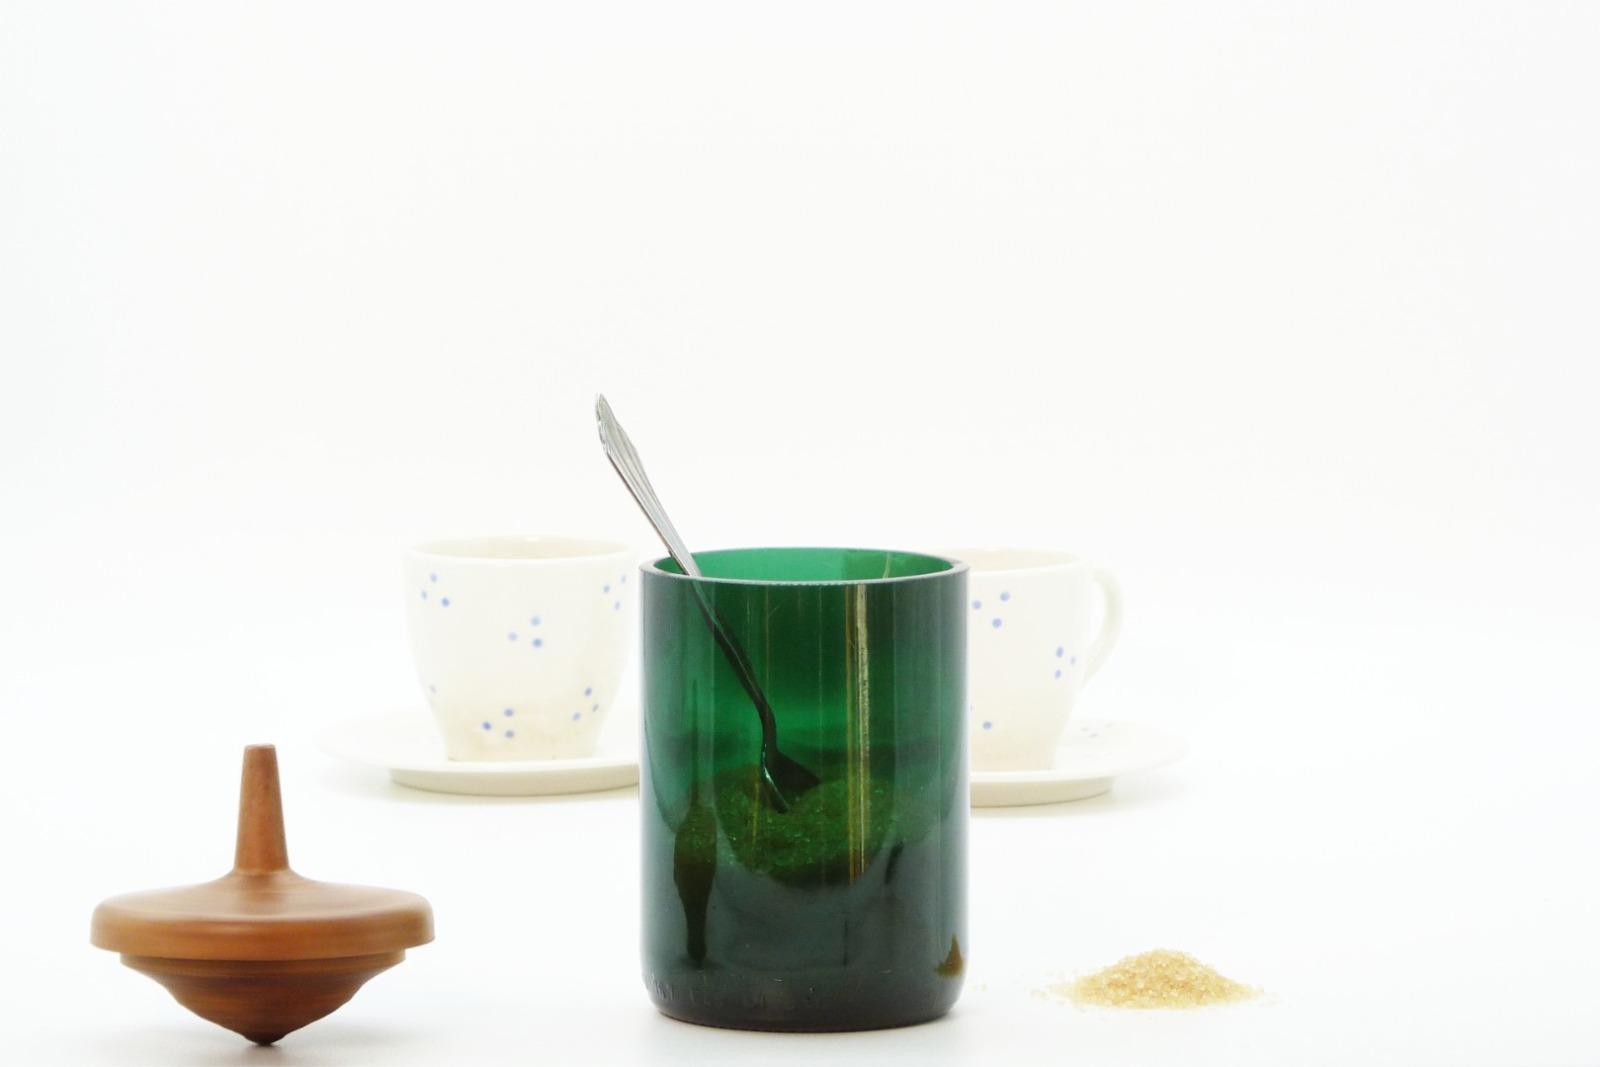 Zuckerdose aus Recyclingglas 6